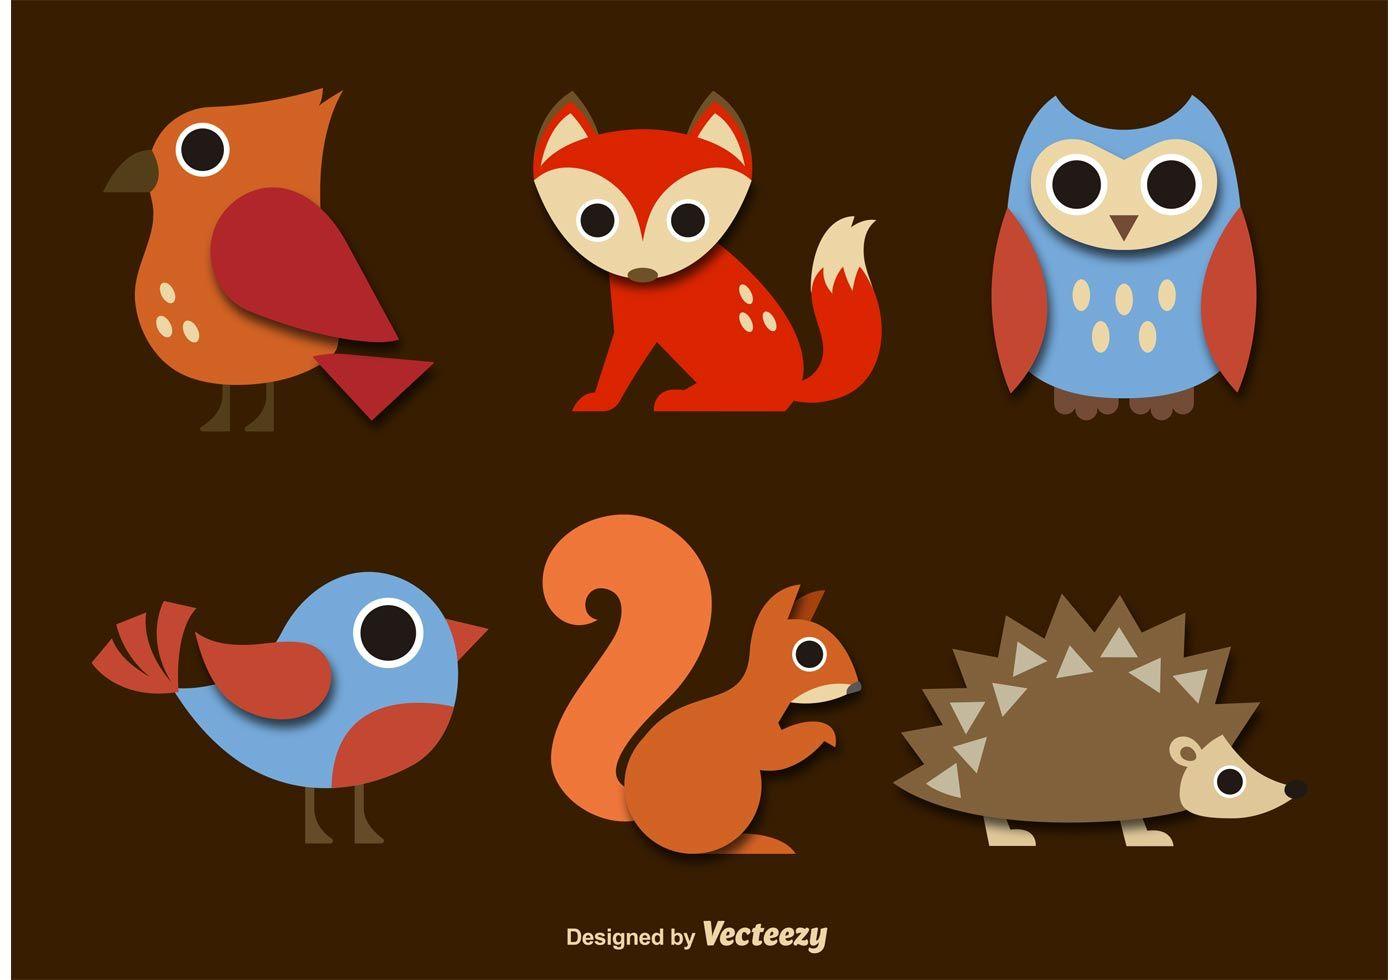 Download Free Vector Art Stock Graphics Images Animal Vector Cute Animal Drawings Kawaii Cute Animal Illustration